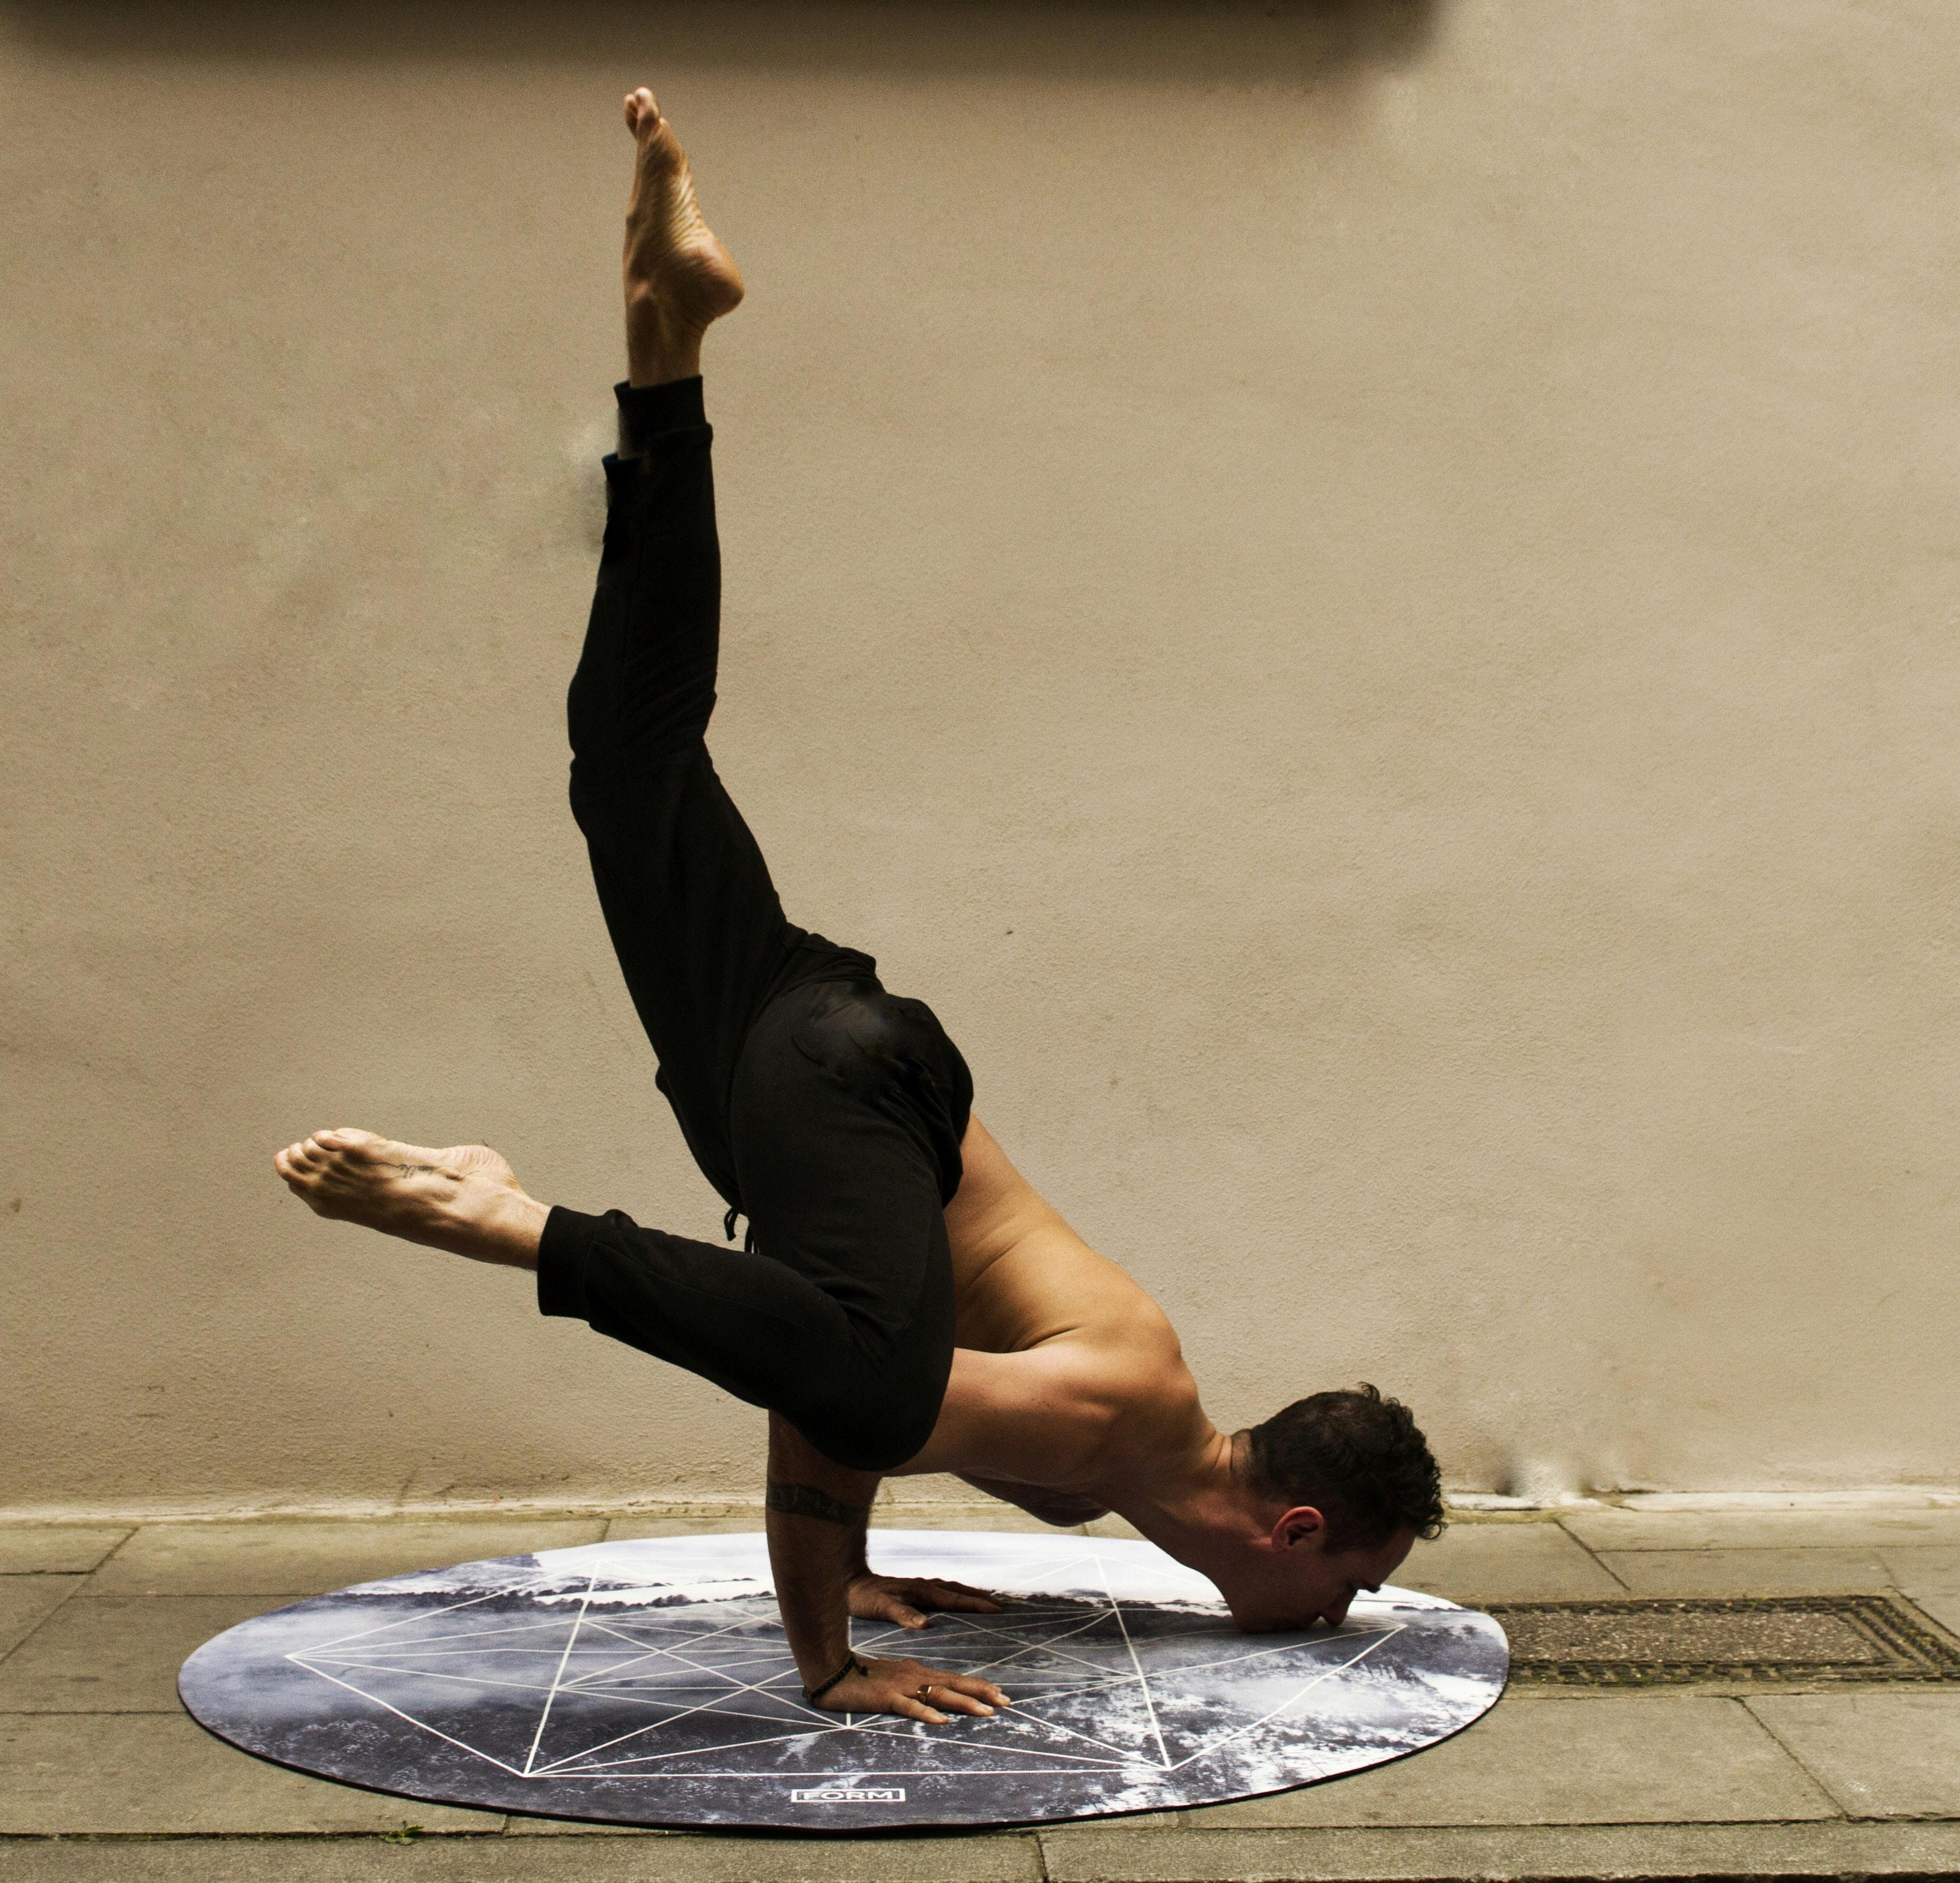 man doing stunt near brown wall